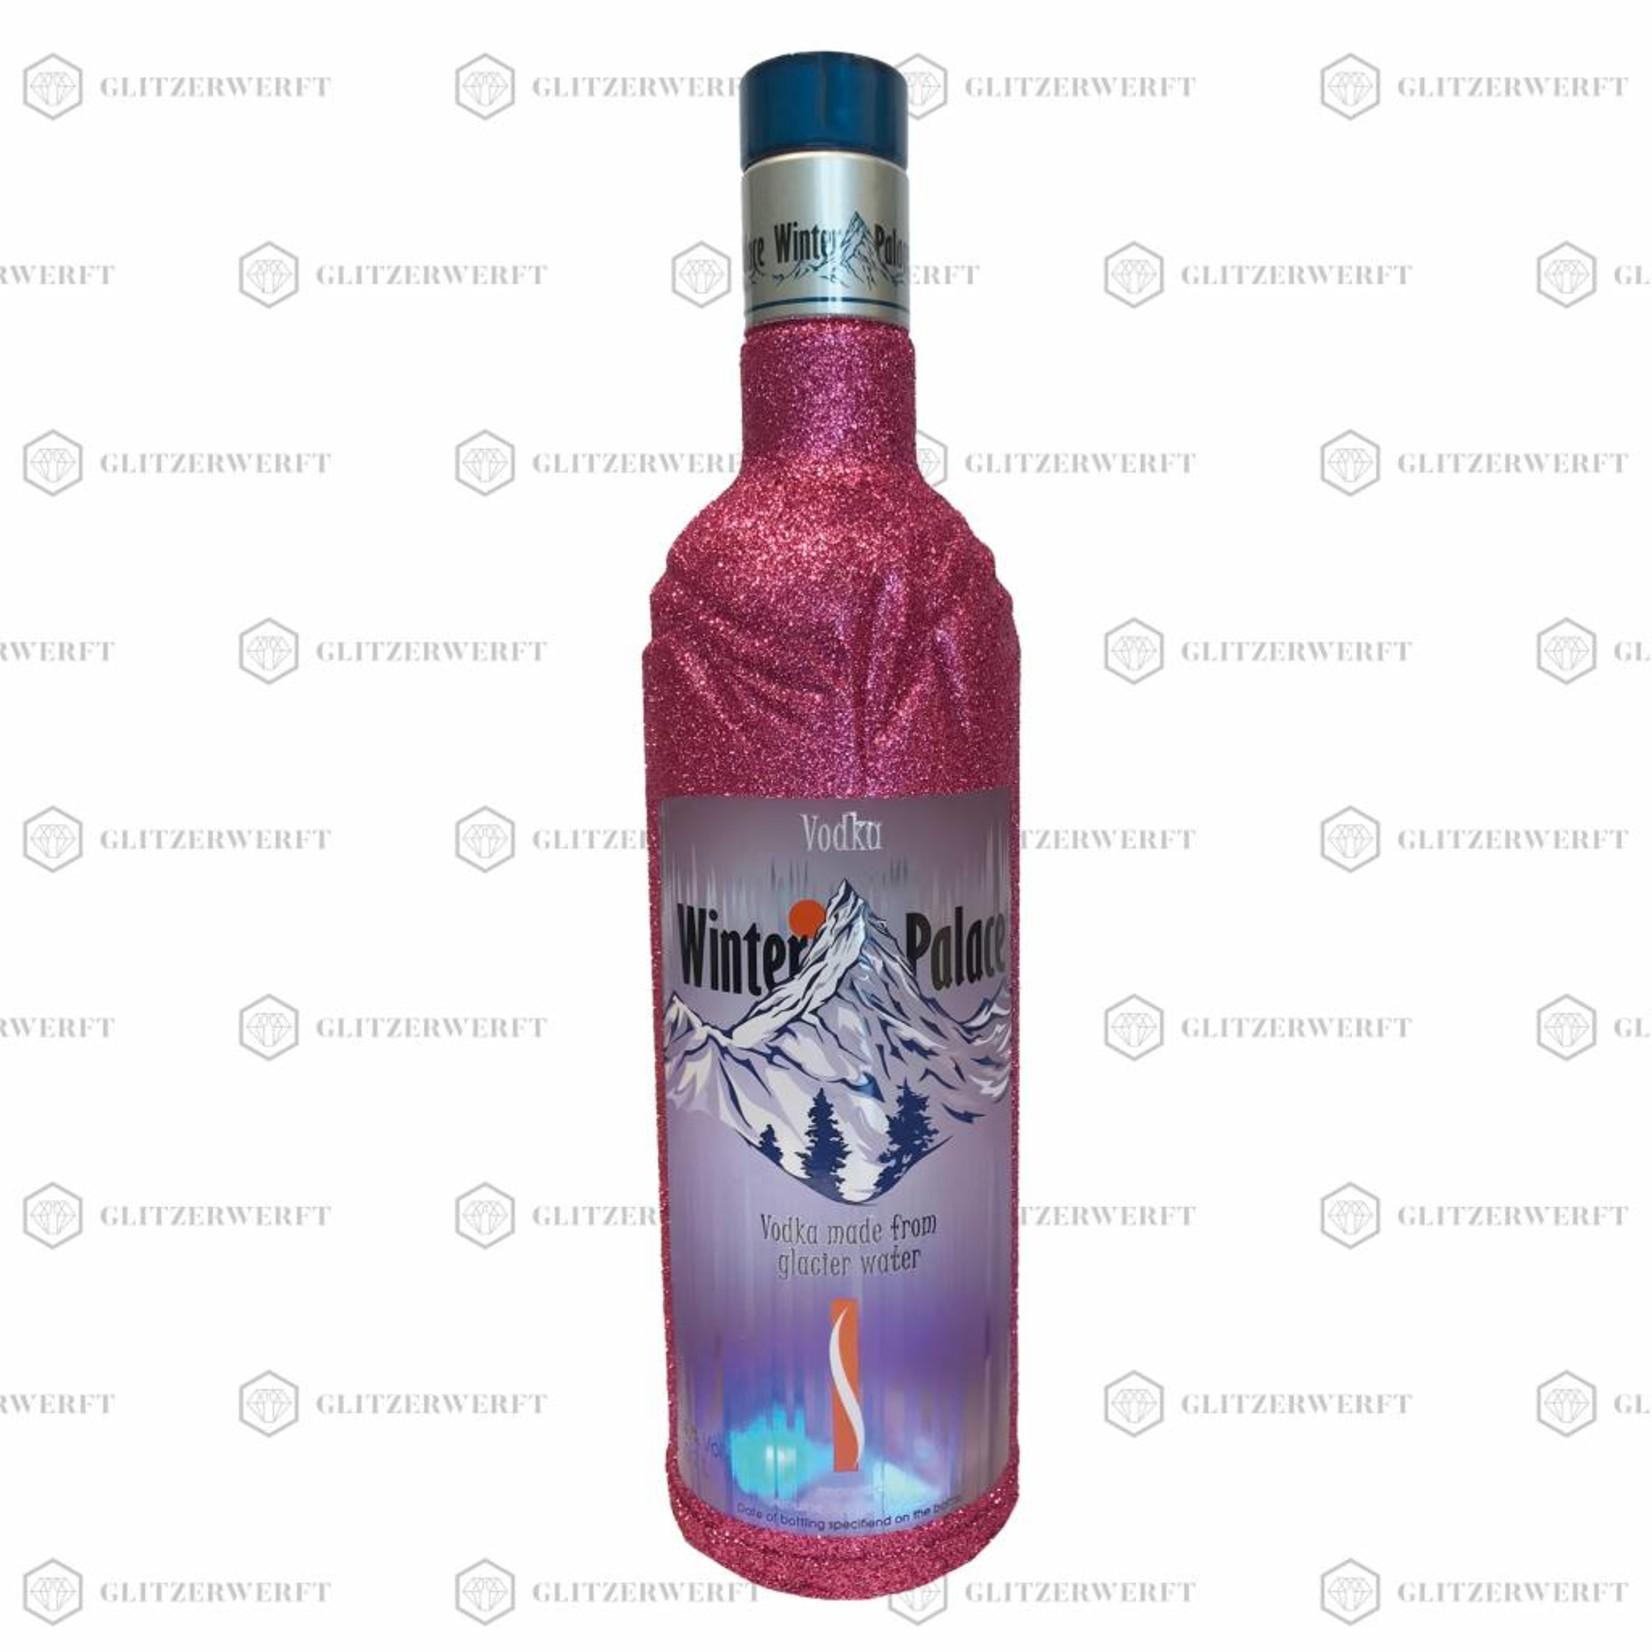 Vodka Glitzer Winter Palace Vodka (0,7L)